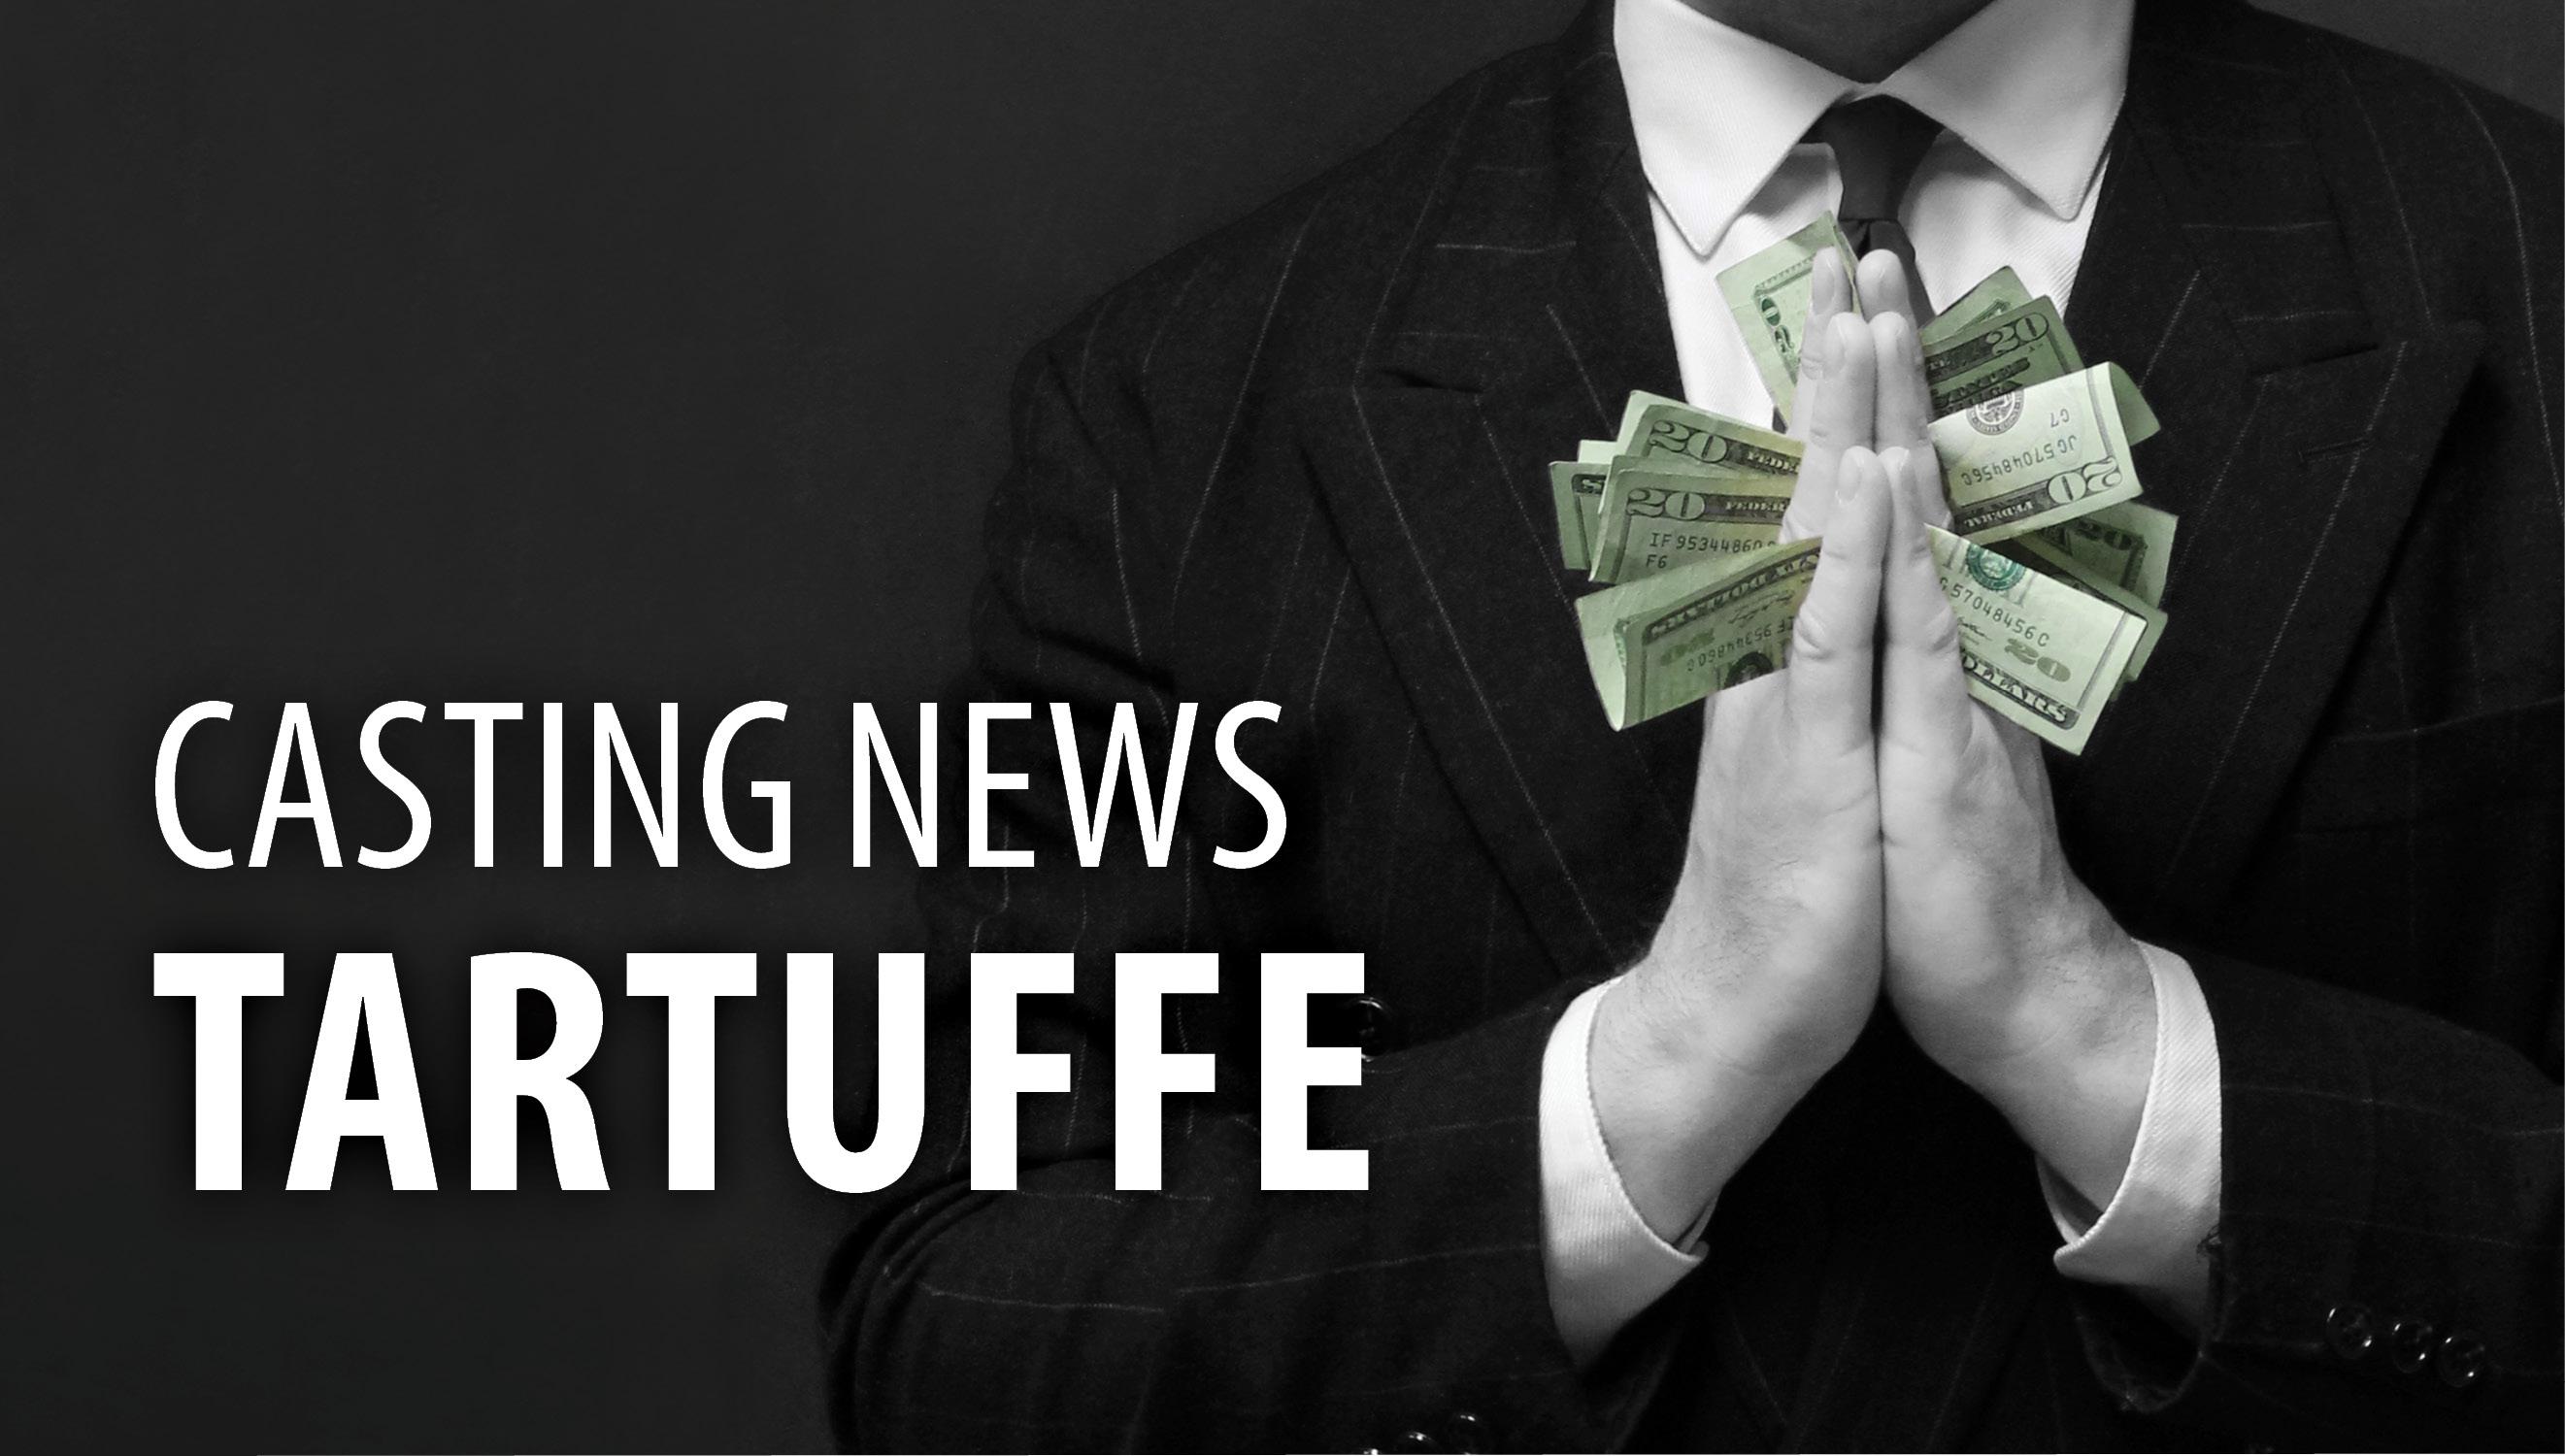 Tartuffe Casting News